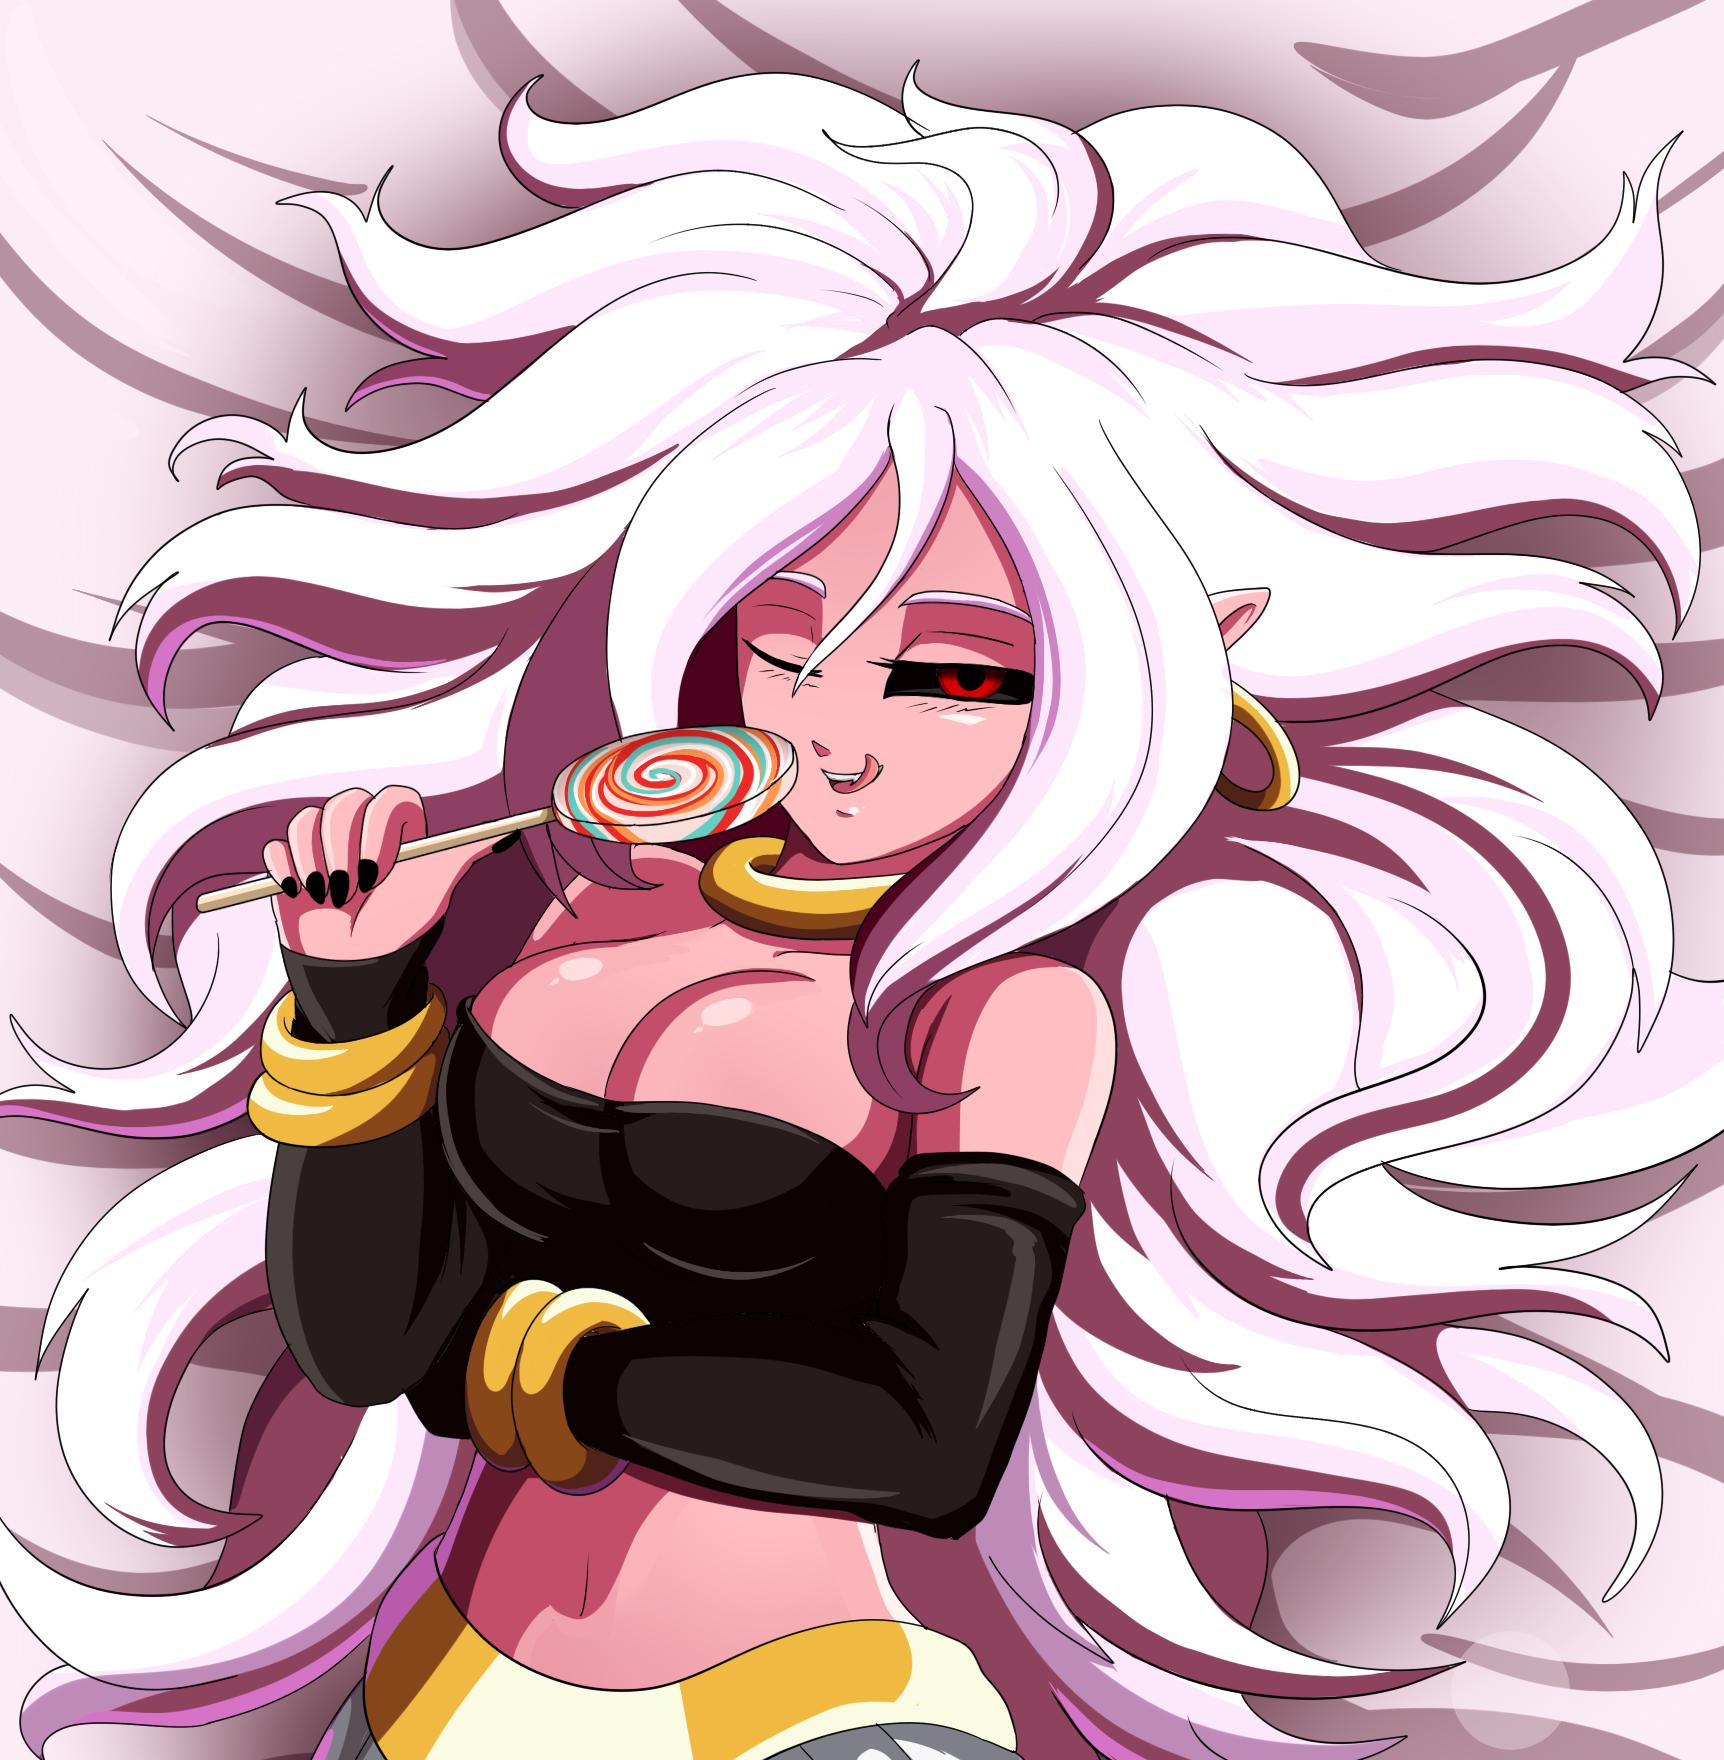 Wallpaper Manisan Rambut Panjang Wanita Dragon Ball Fighterz Berbaring Telentang Melihat Viewer Android 21 Majin Android 21 1724x1760 Optifine 1333887 Hd Wallpapers Wallhere